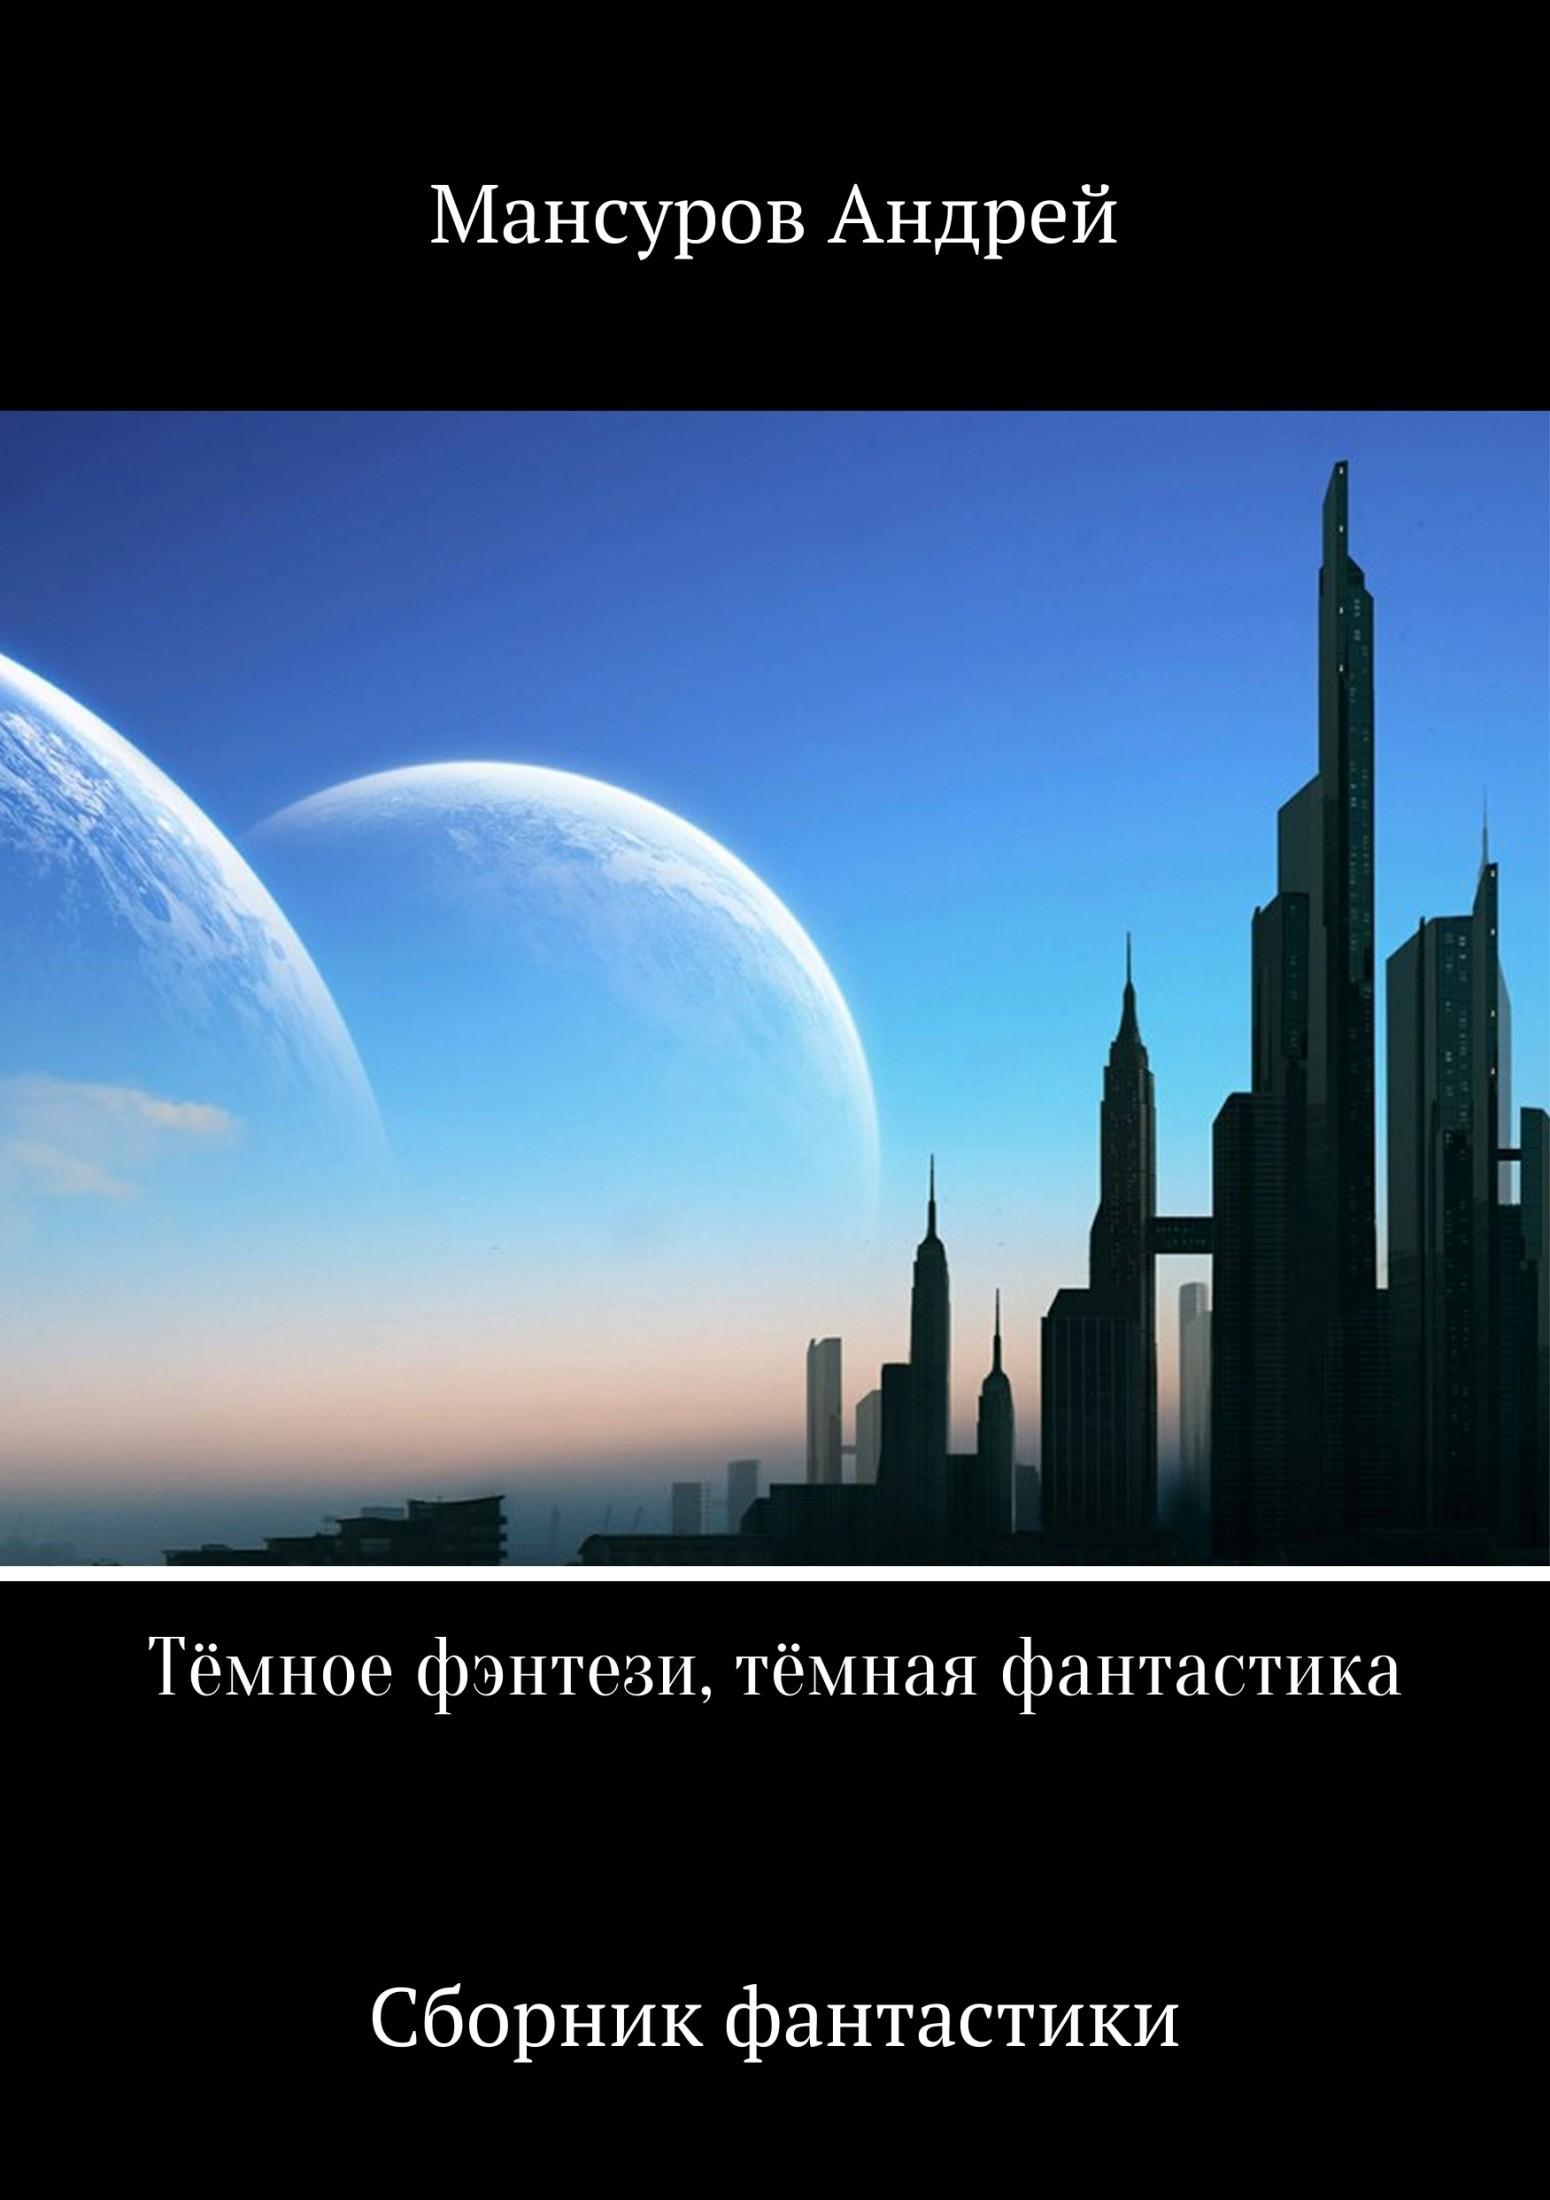 Андрей Арсланович Мансуров Тёмное фэнтези, тёмная фантастика андрей арсланович мансуров океан